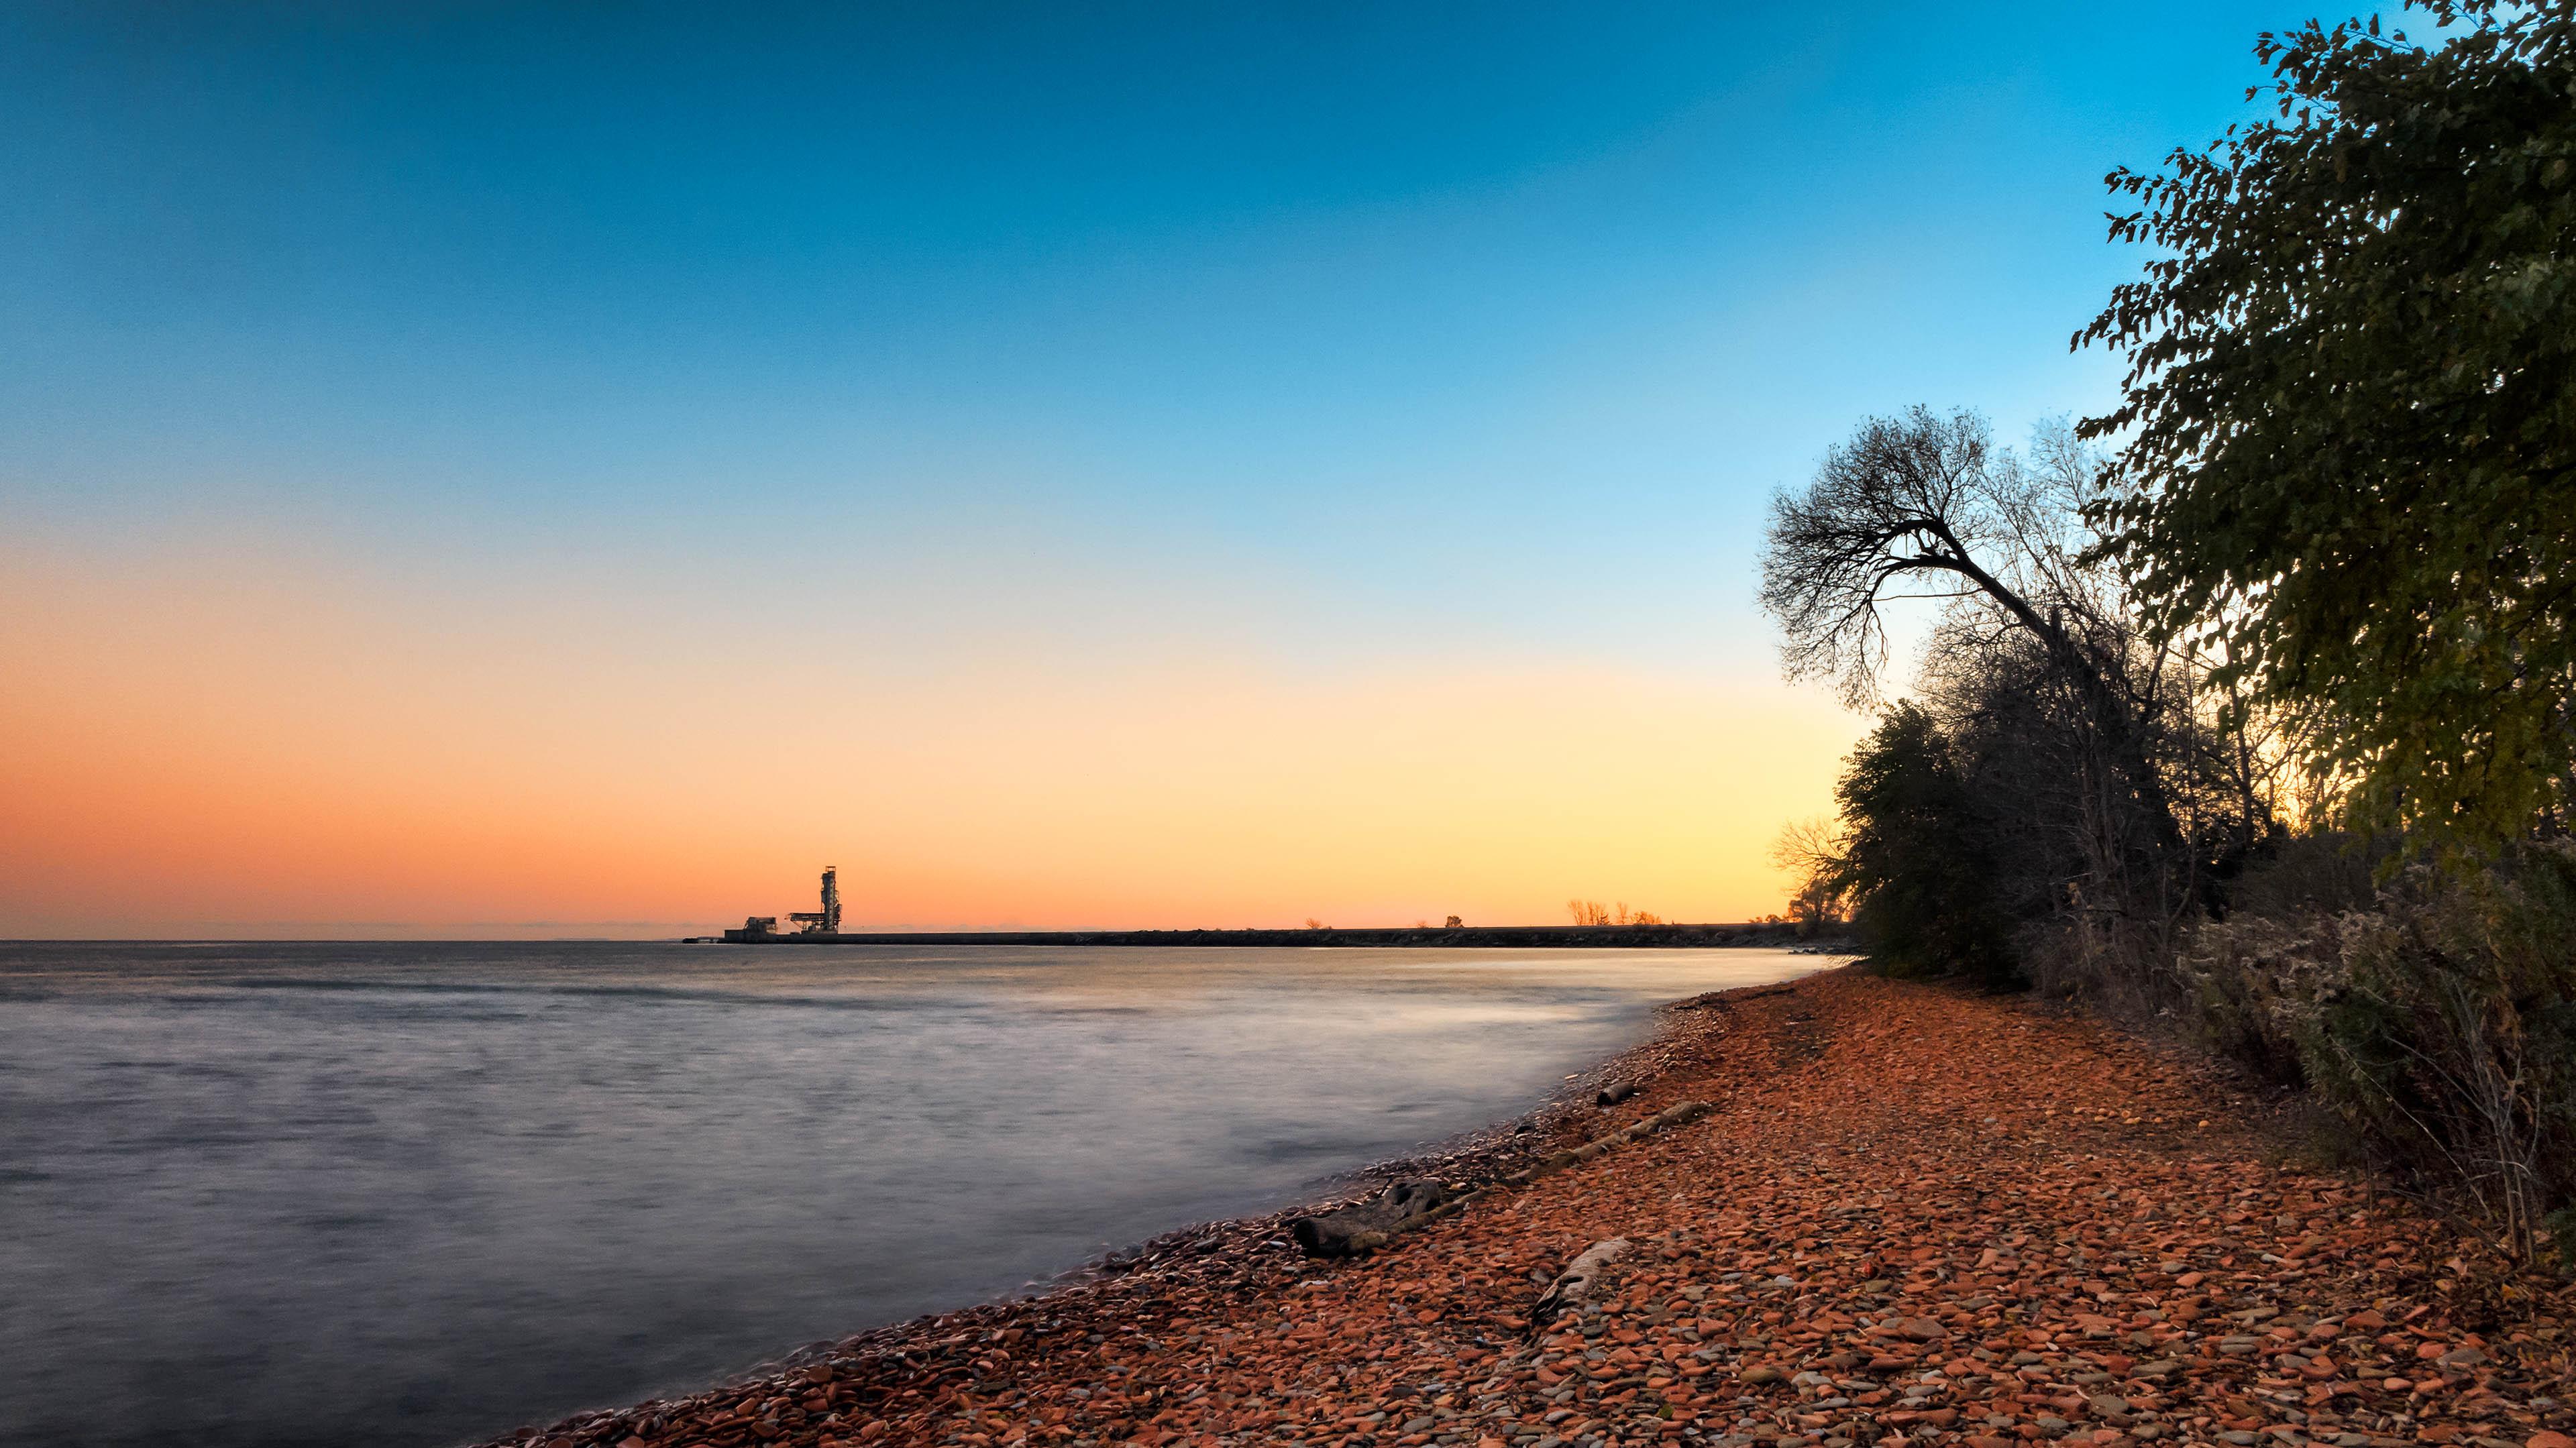 Sunset on Lake Ontario, Beach, Ontario, Sky, Shore, HQ Photo